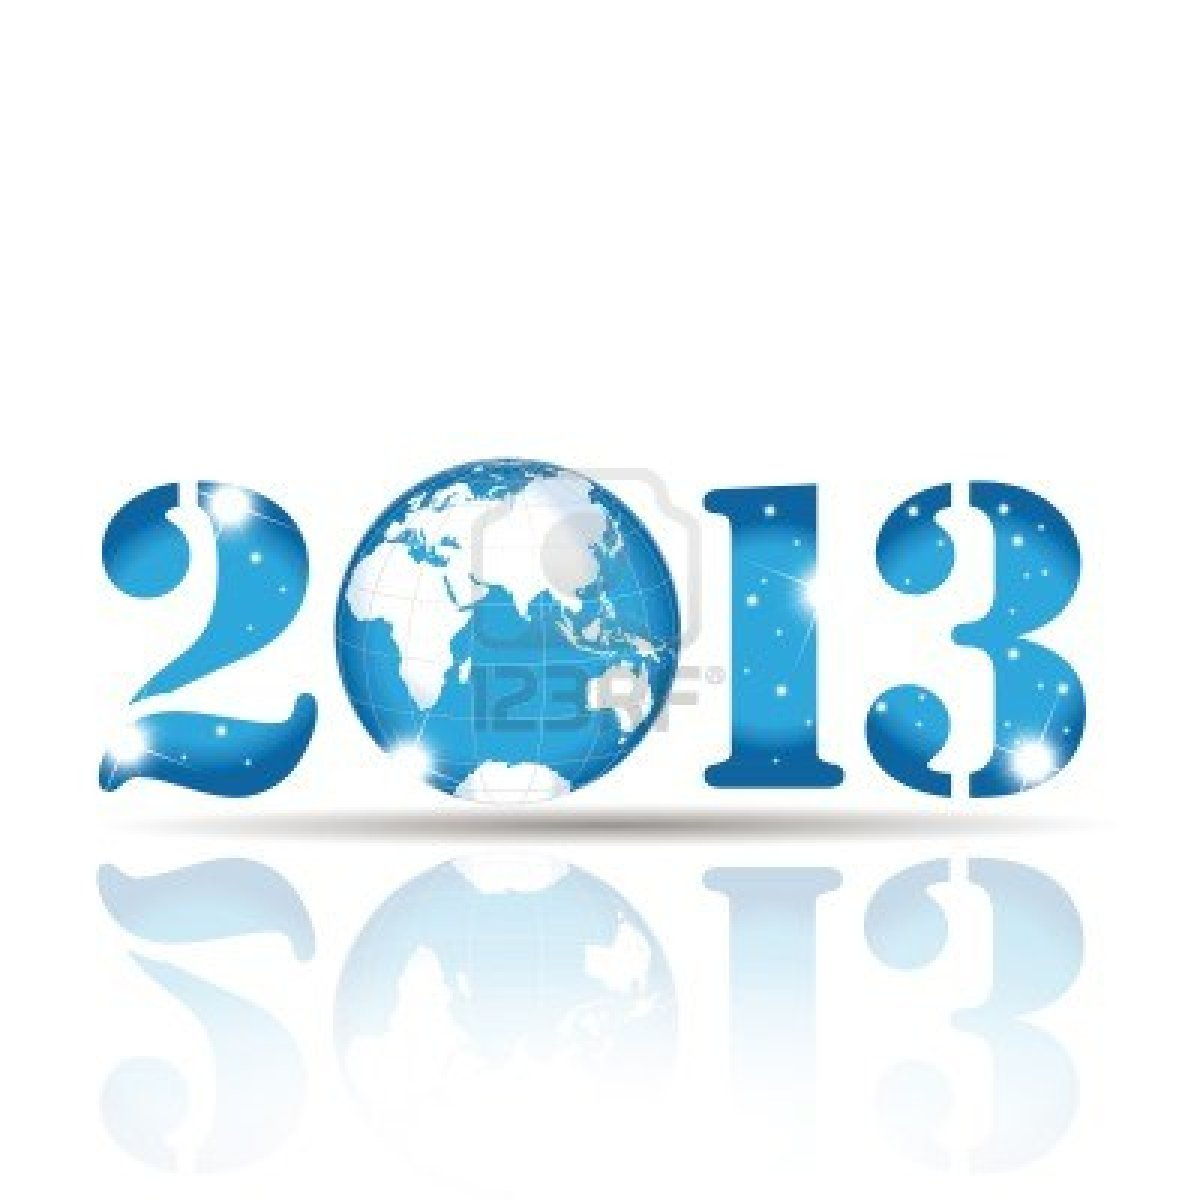 Sretno vam bilo 2013!